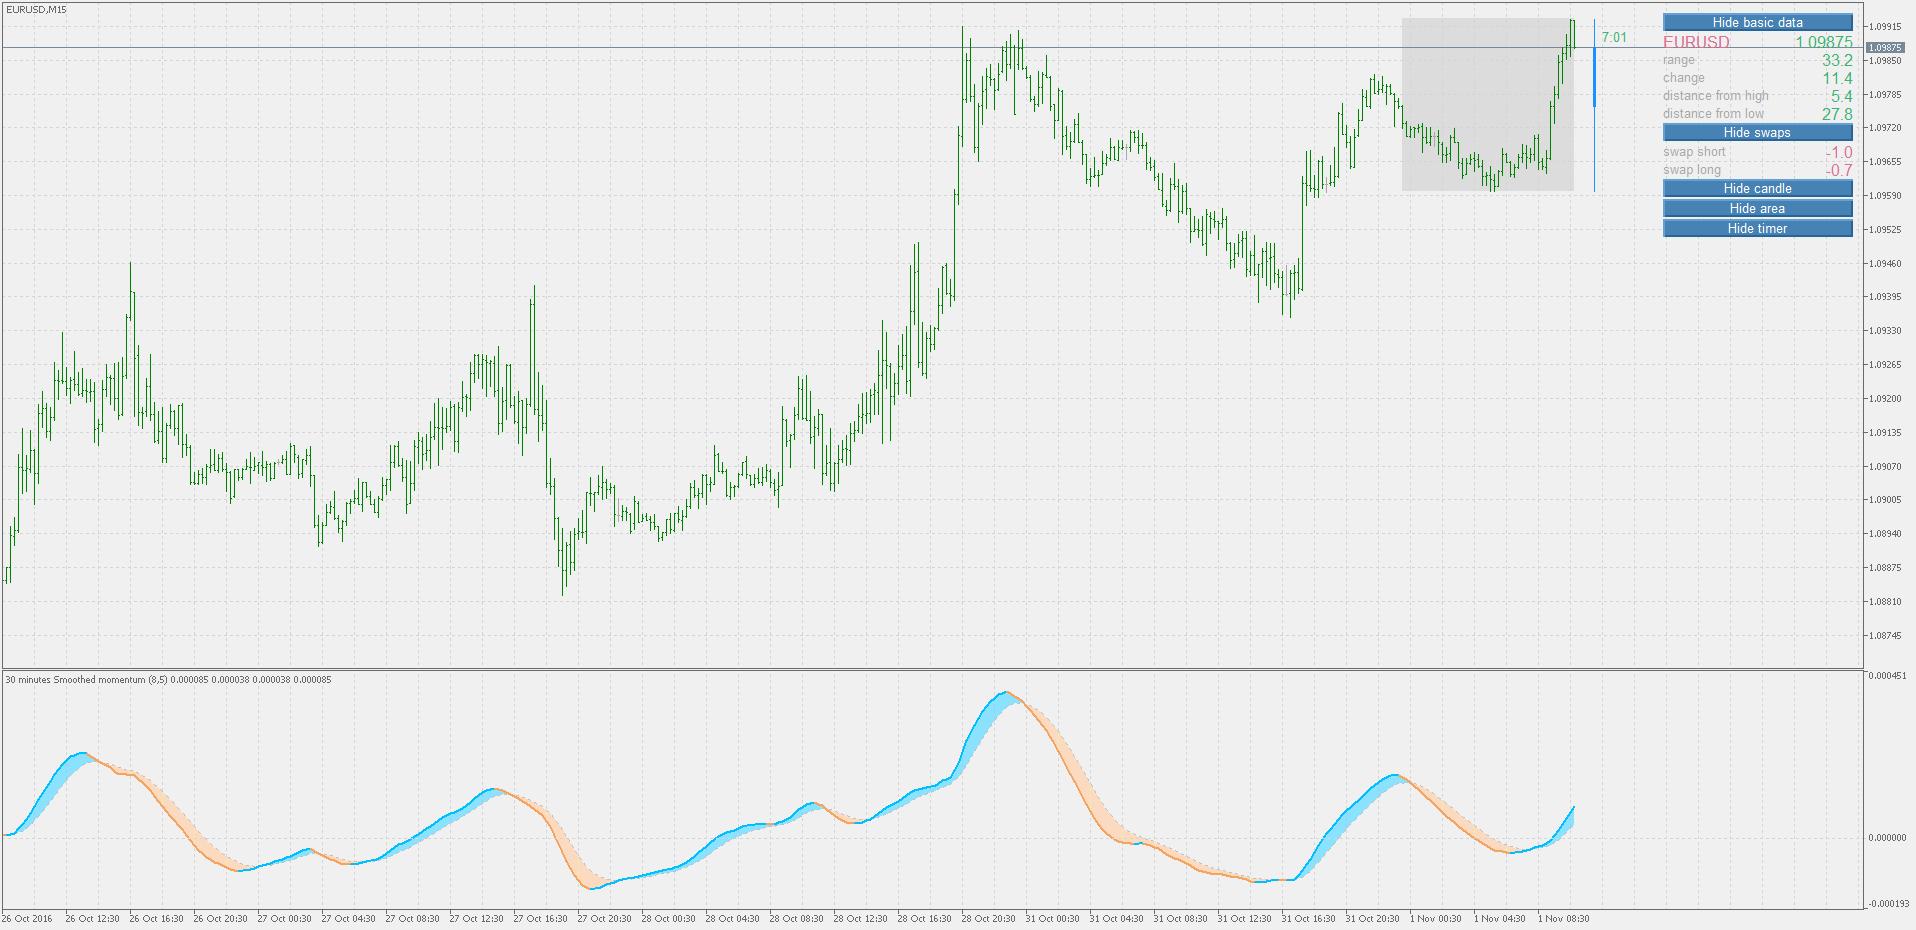 MT5 Versions of Momentum,Velocity and ROC indicators